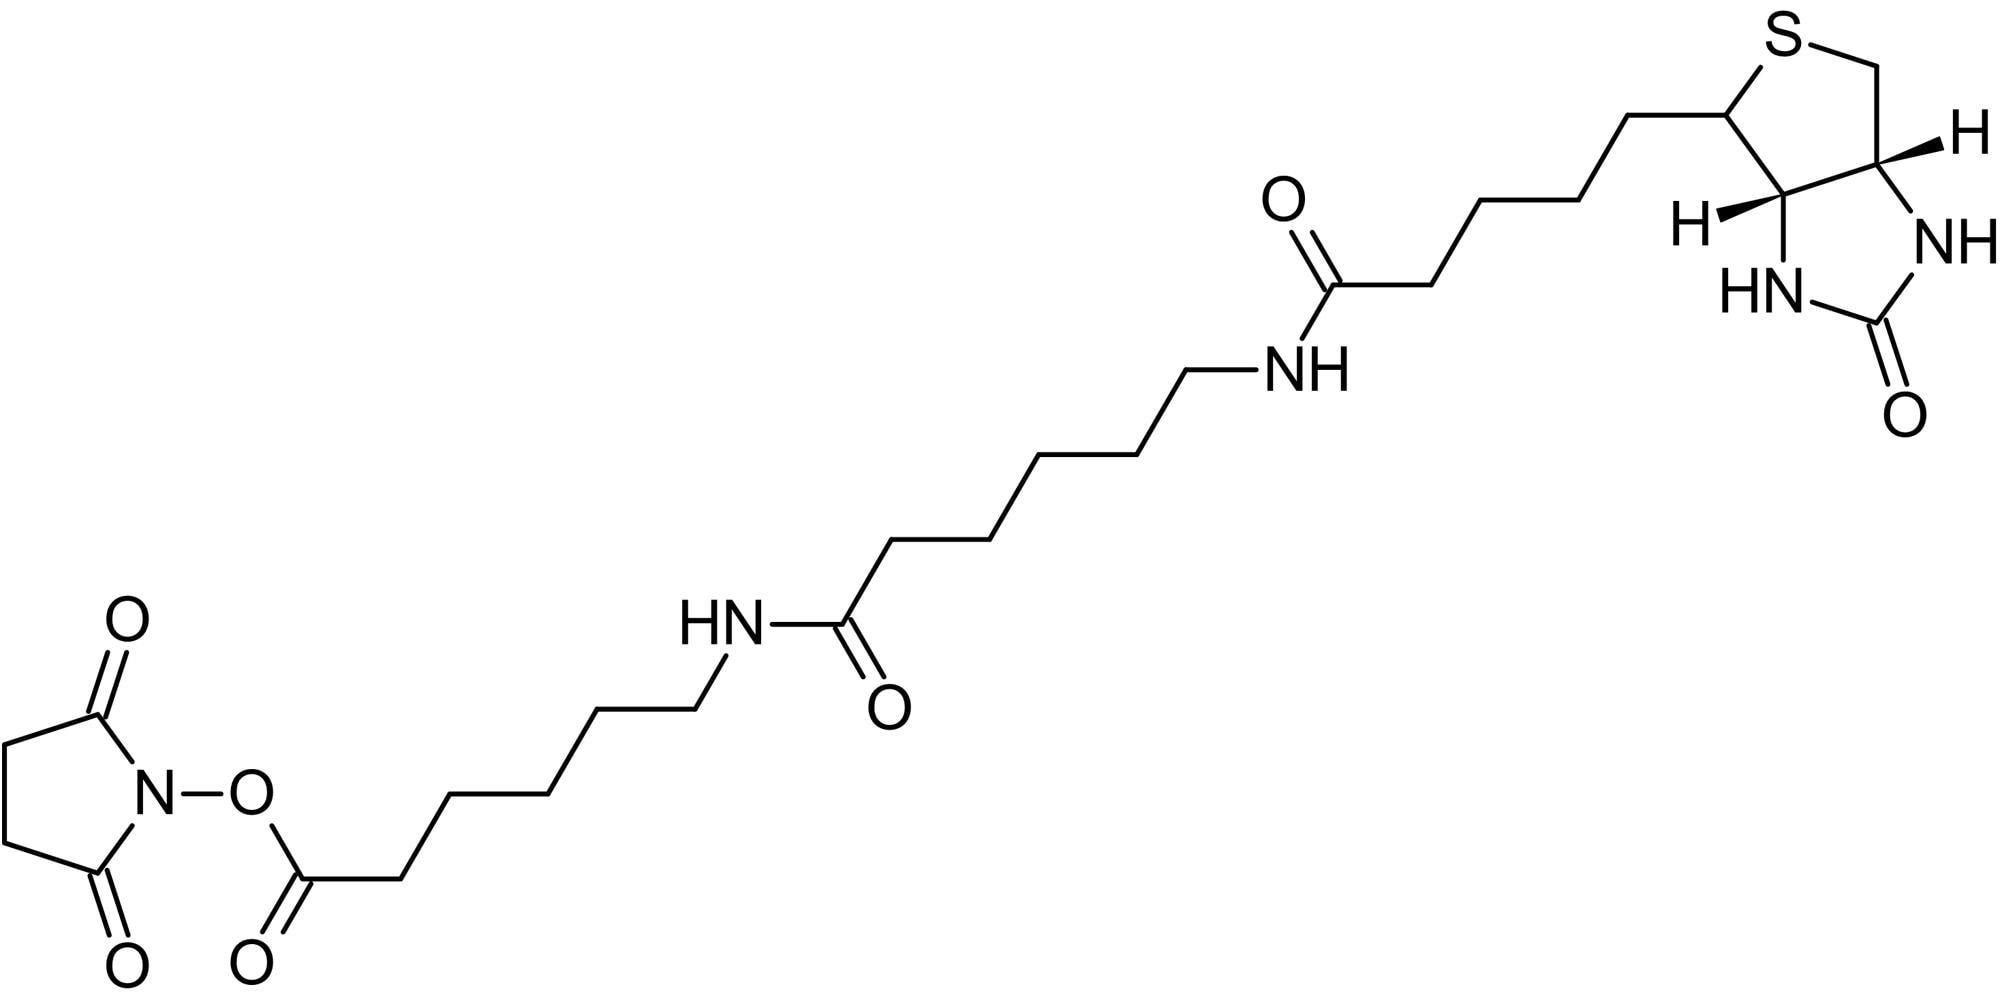 Chemical Structure - Biotin-LC-LC-NHS, Biotinylating agent (ab145618)